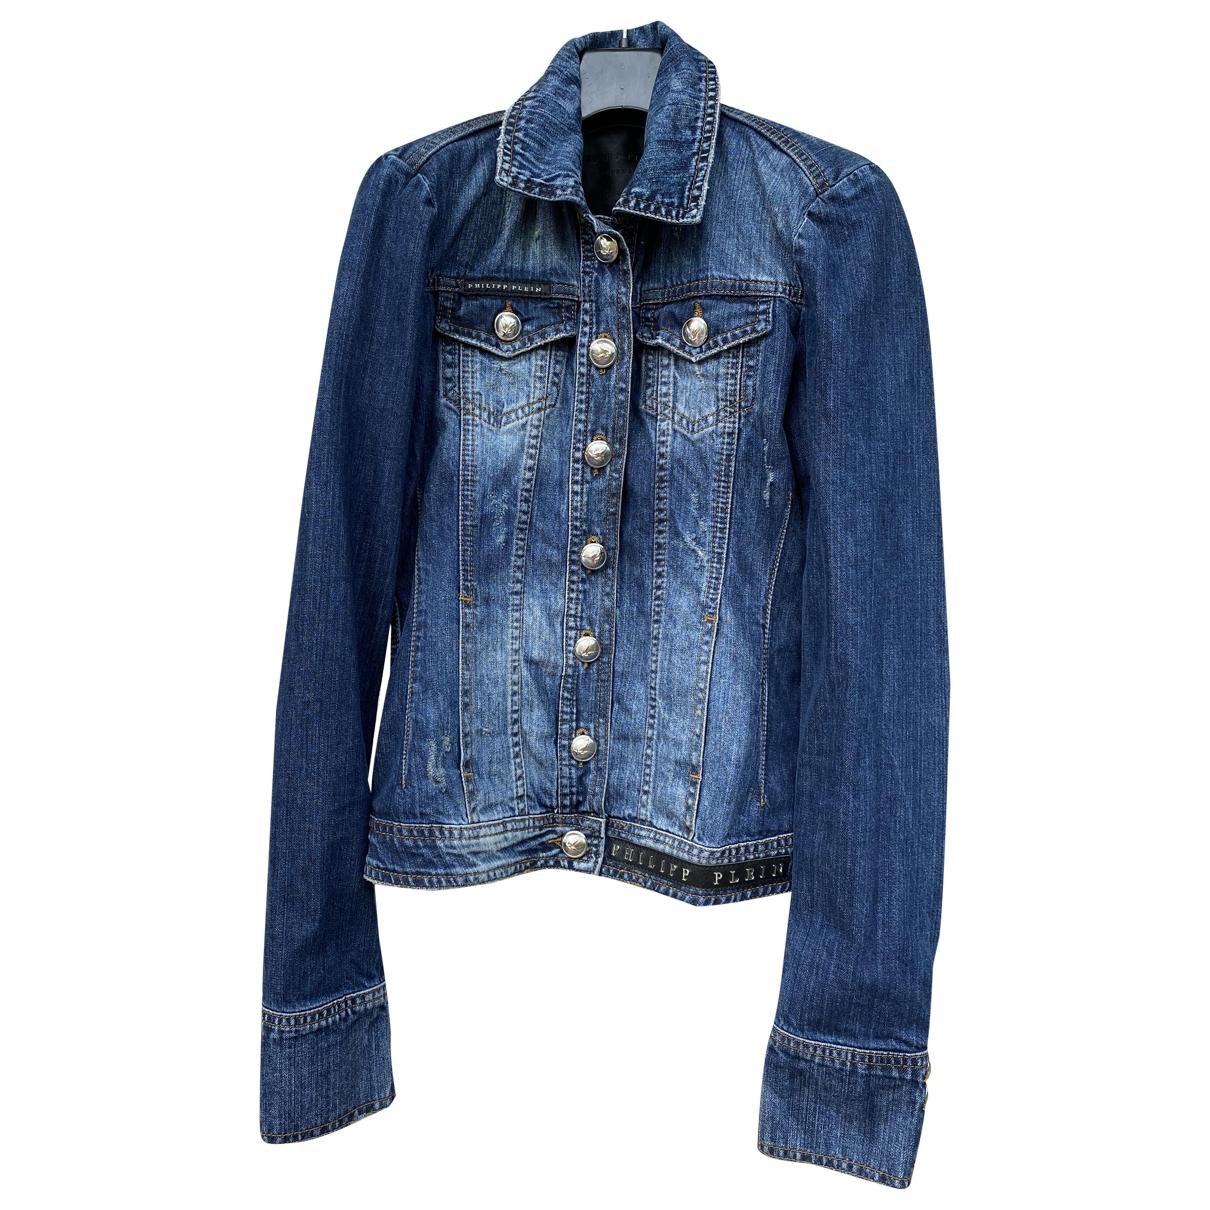 Philipp Plein \N Jacke in  Blau Denim - Jeans